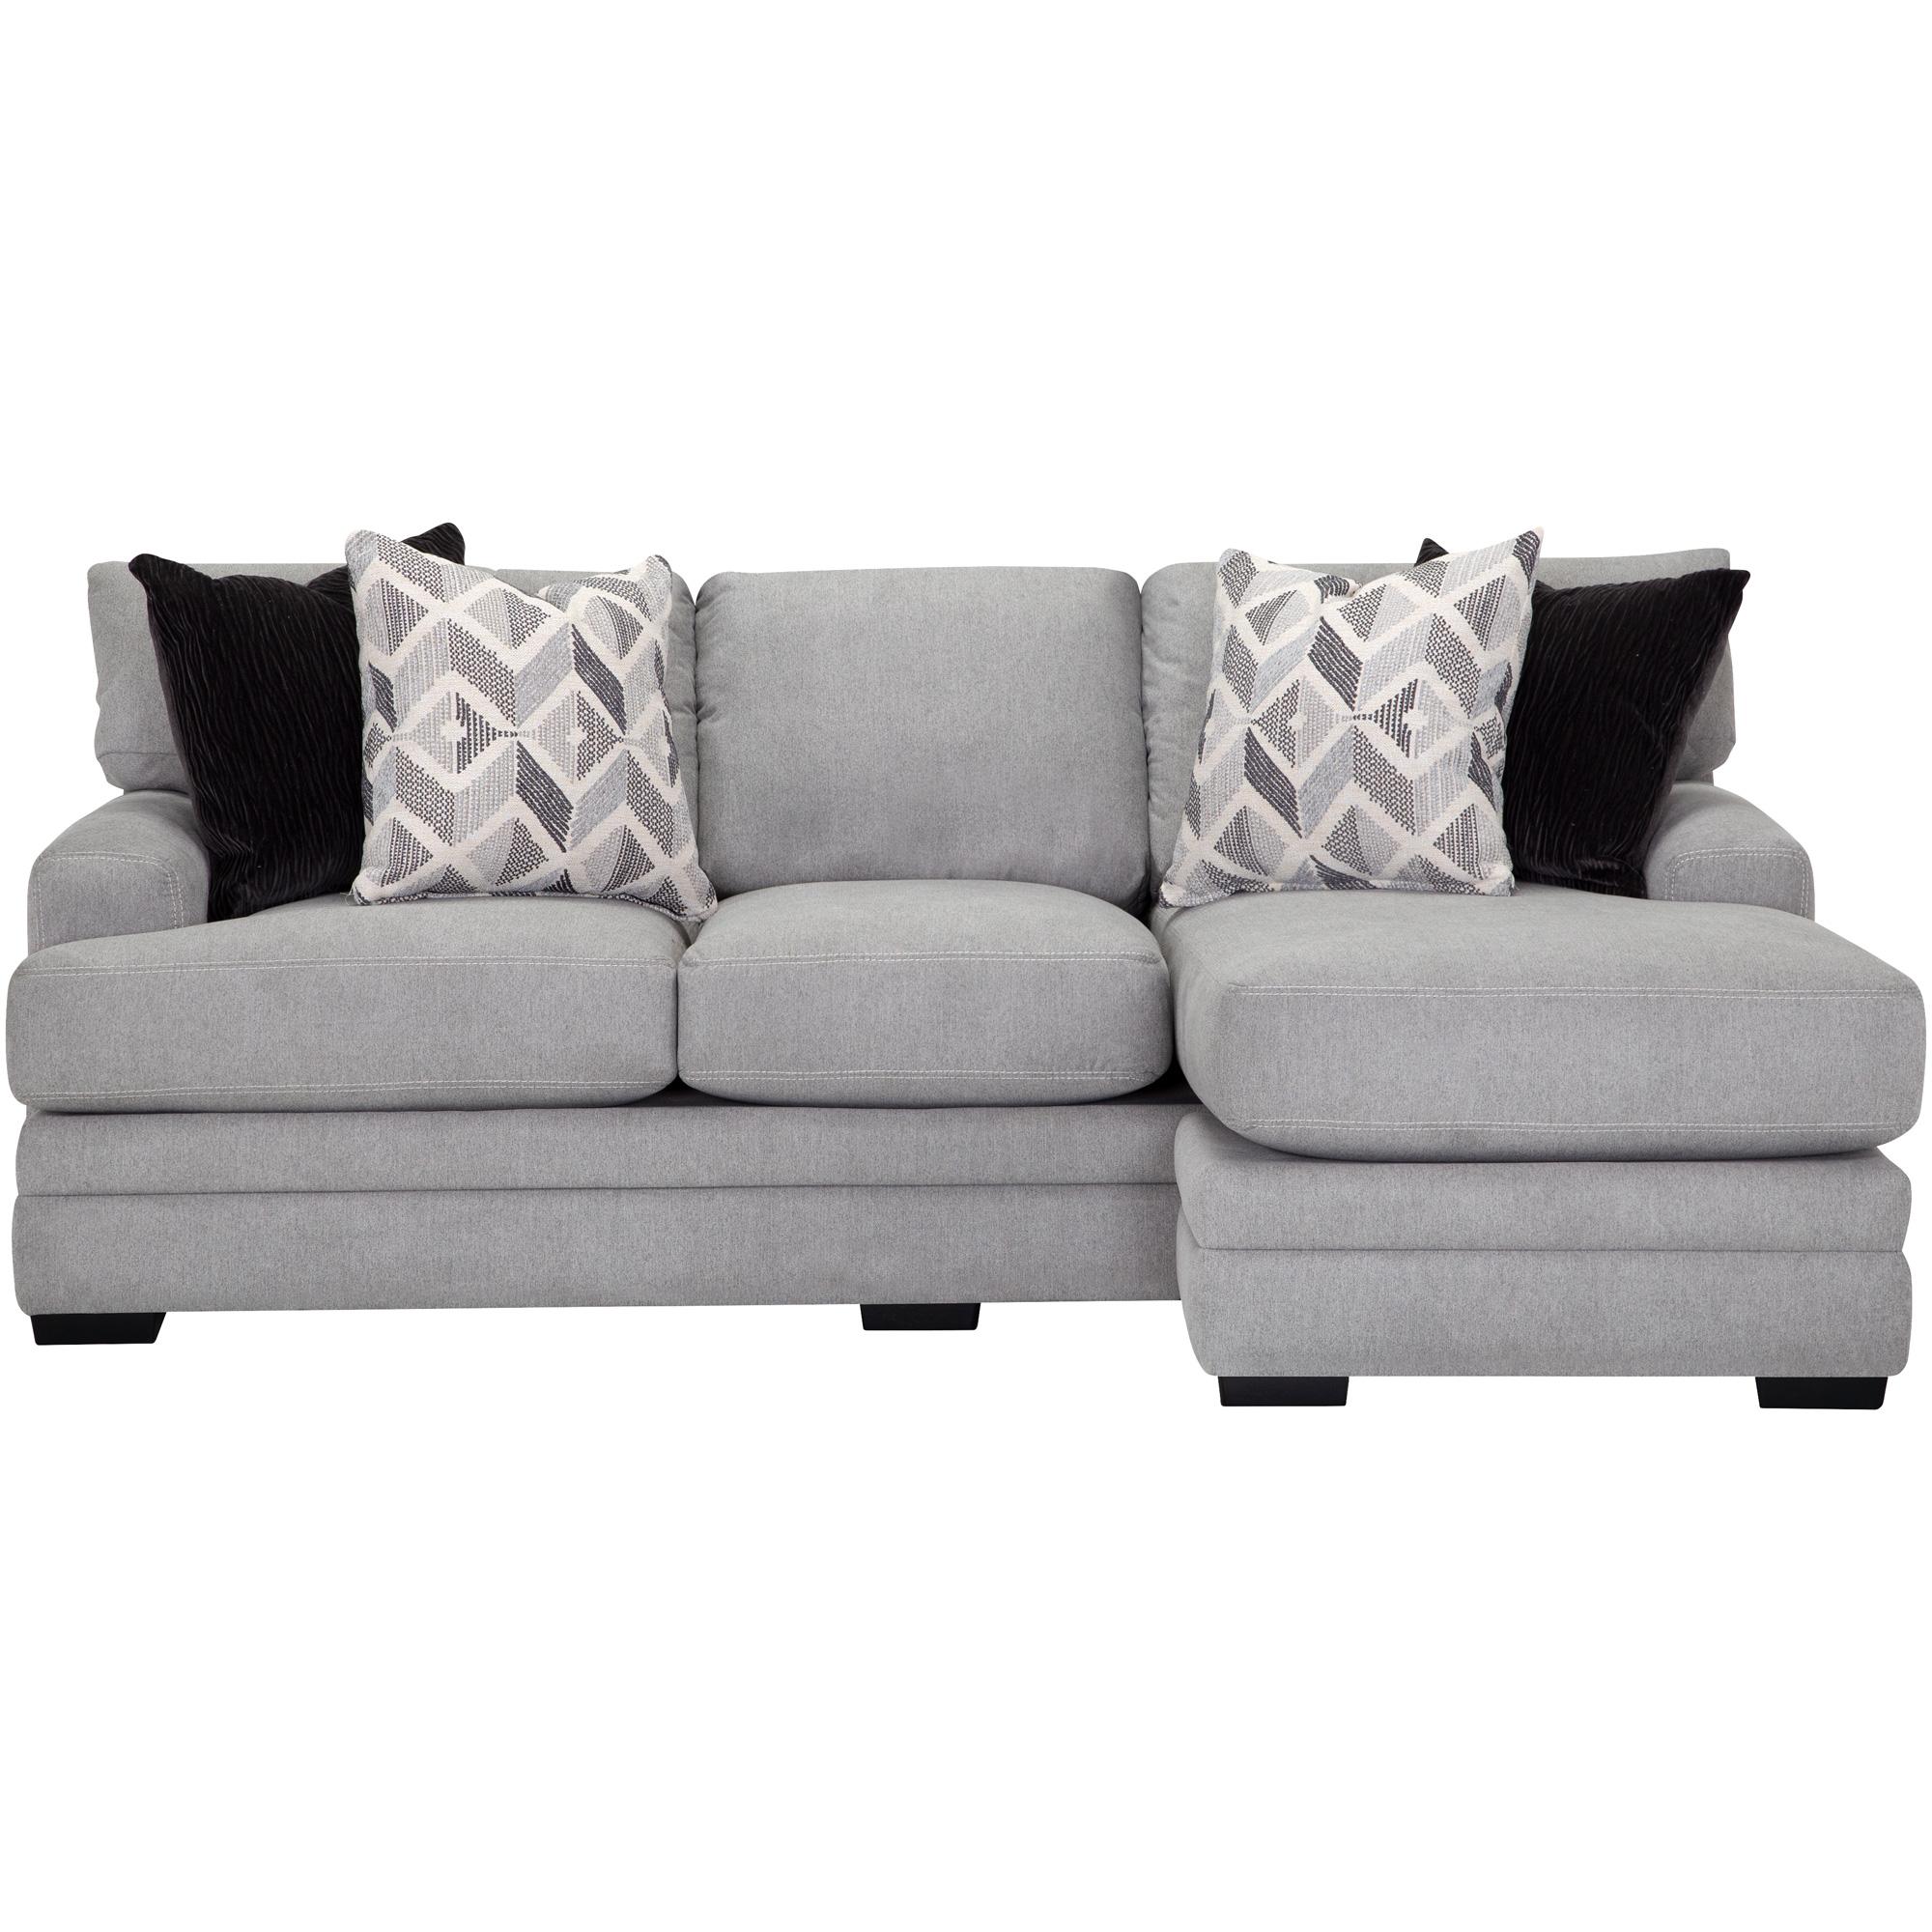 Franklin | Avanti Pebble Chaise Sofa